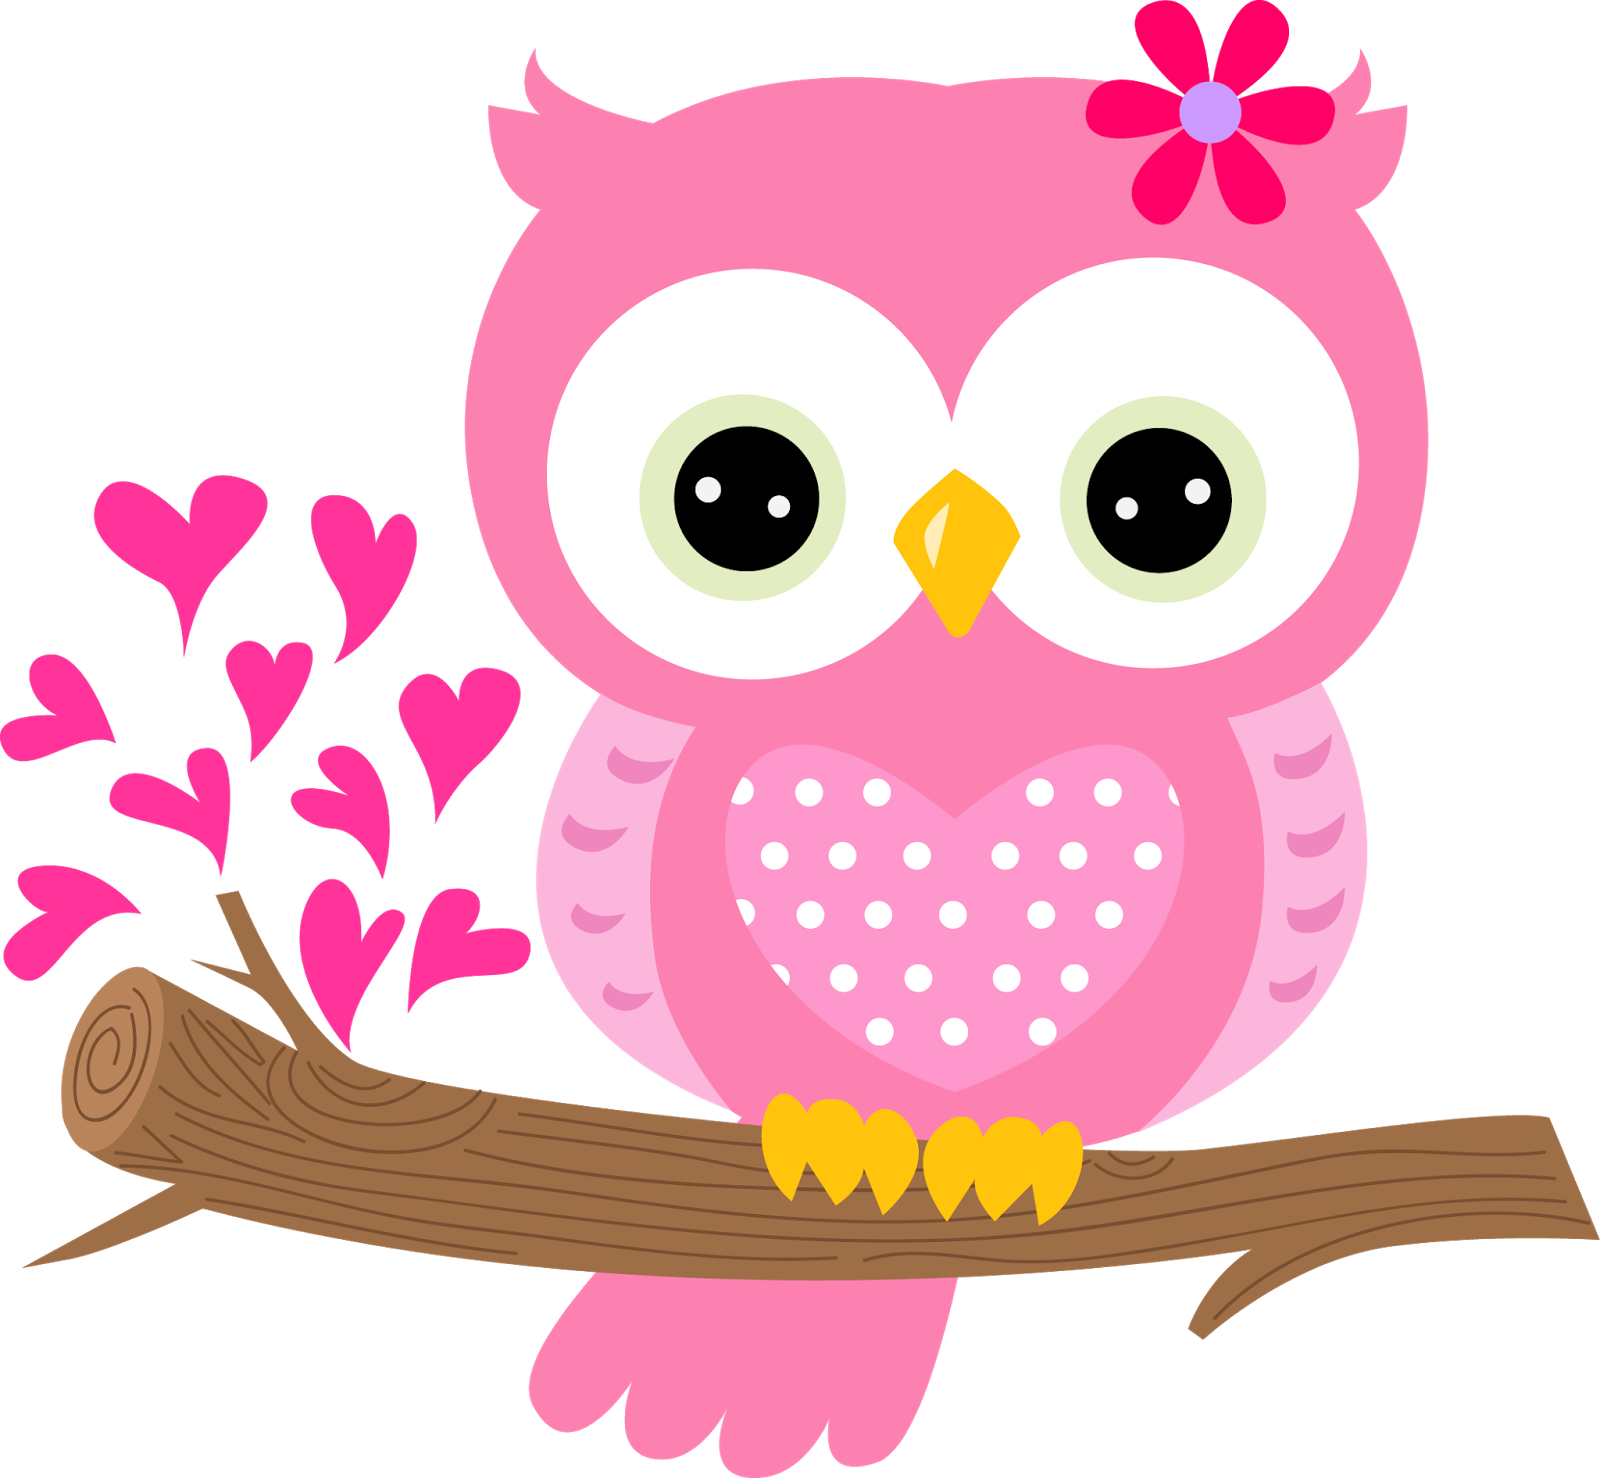 Cute valentine owl clipart png transparent download 88 best ideas about buhos on Pinterest | Clip art, Gifs and Bebe png transparent download